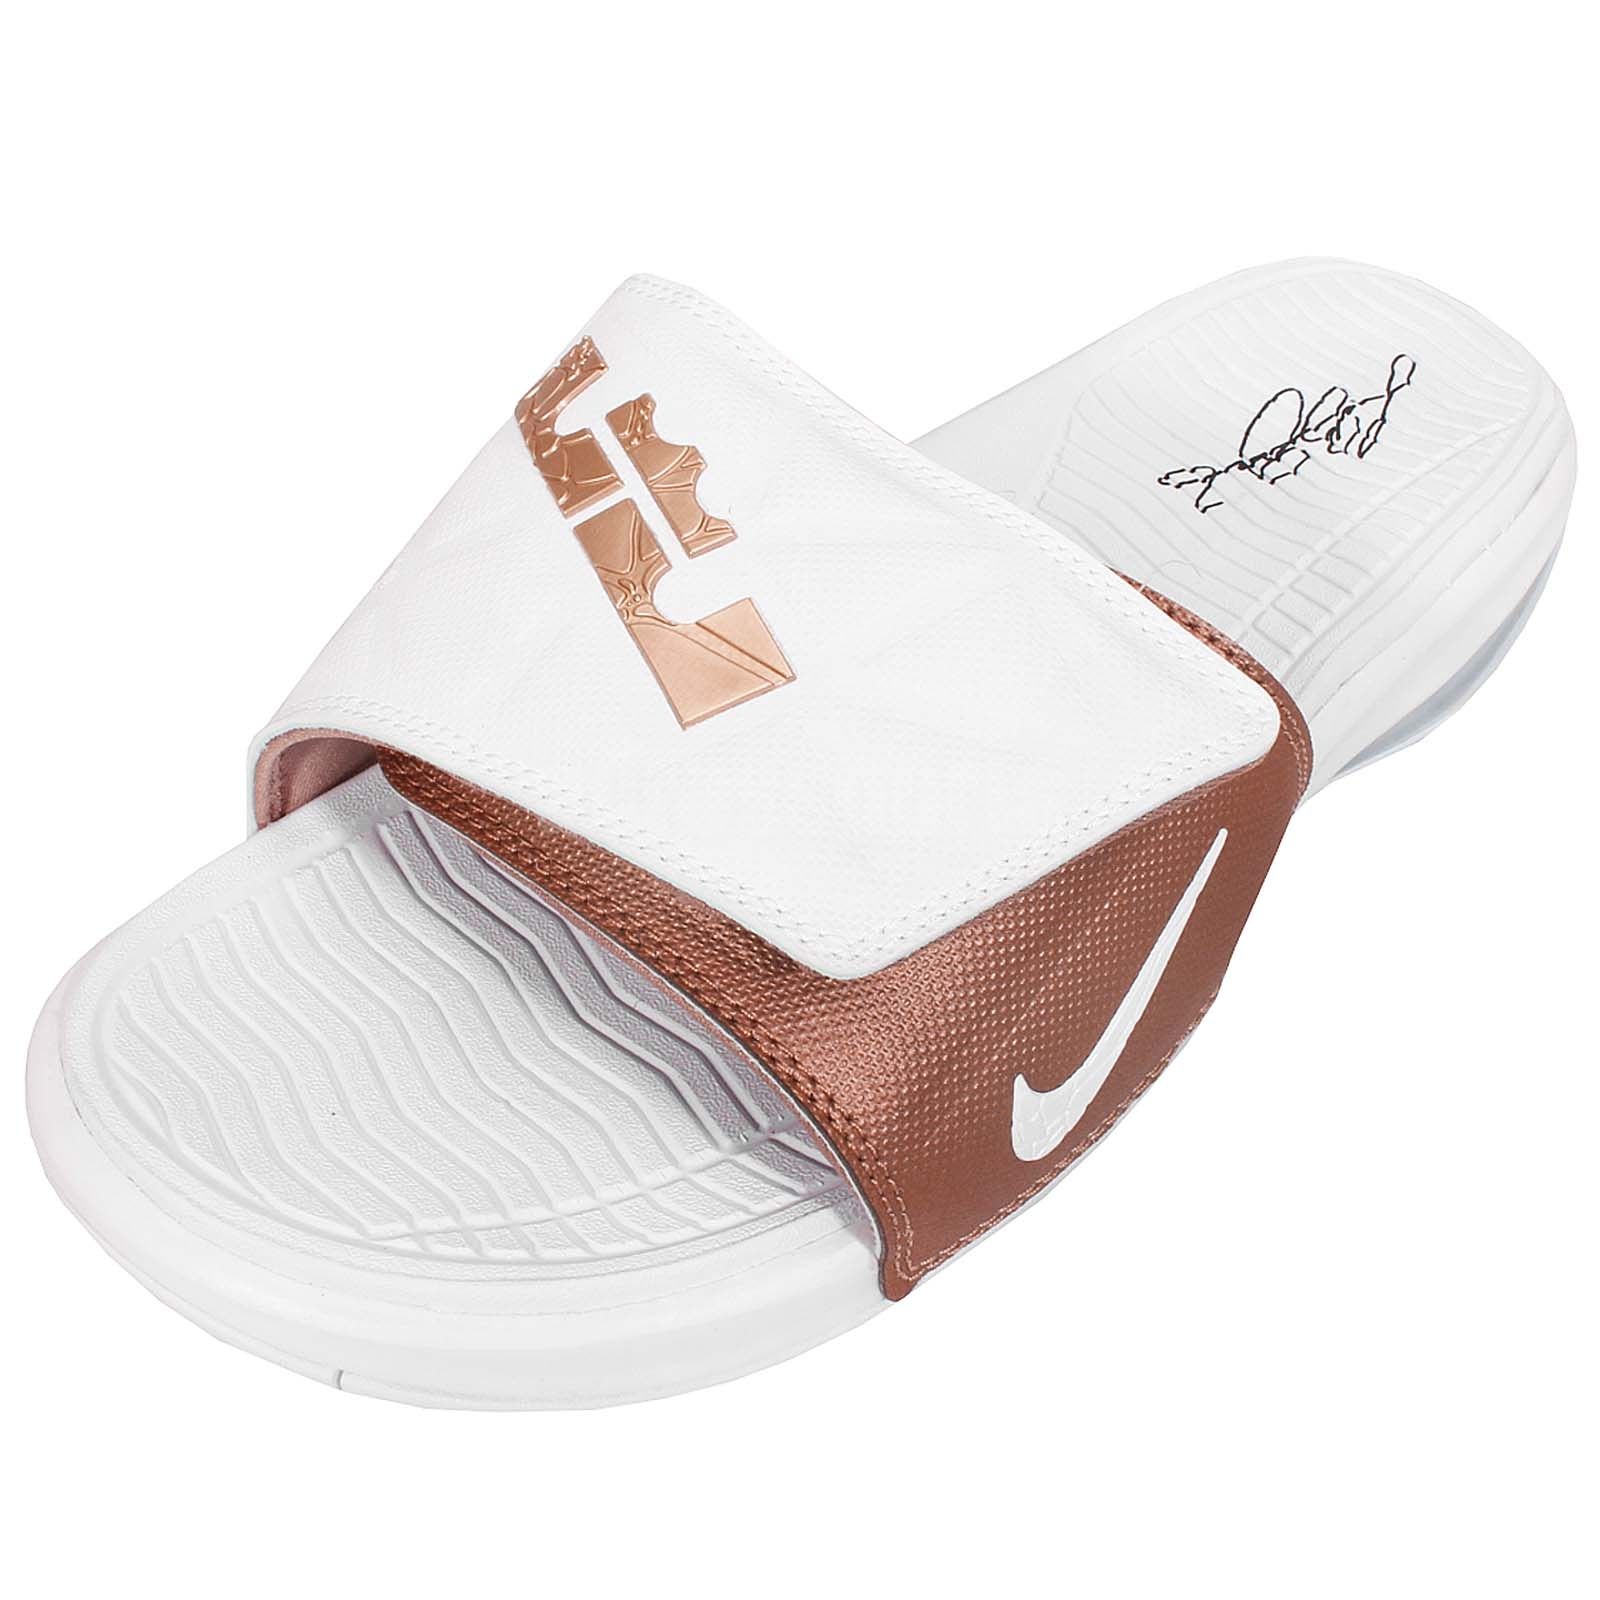 b6b91e710f60 Buy lebron james sandals   OFF63% Discounted